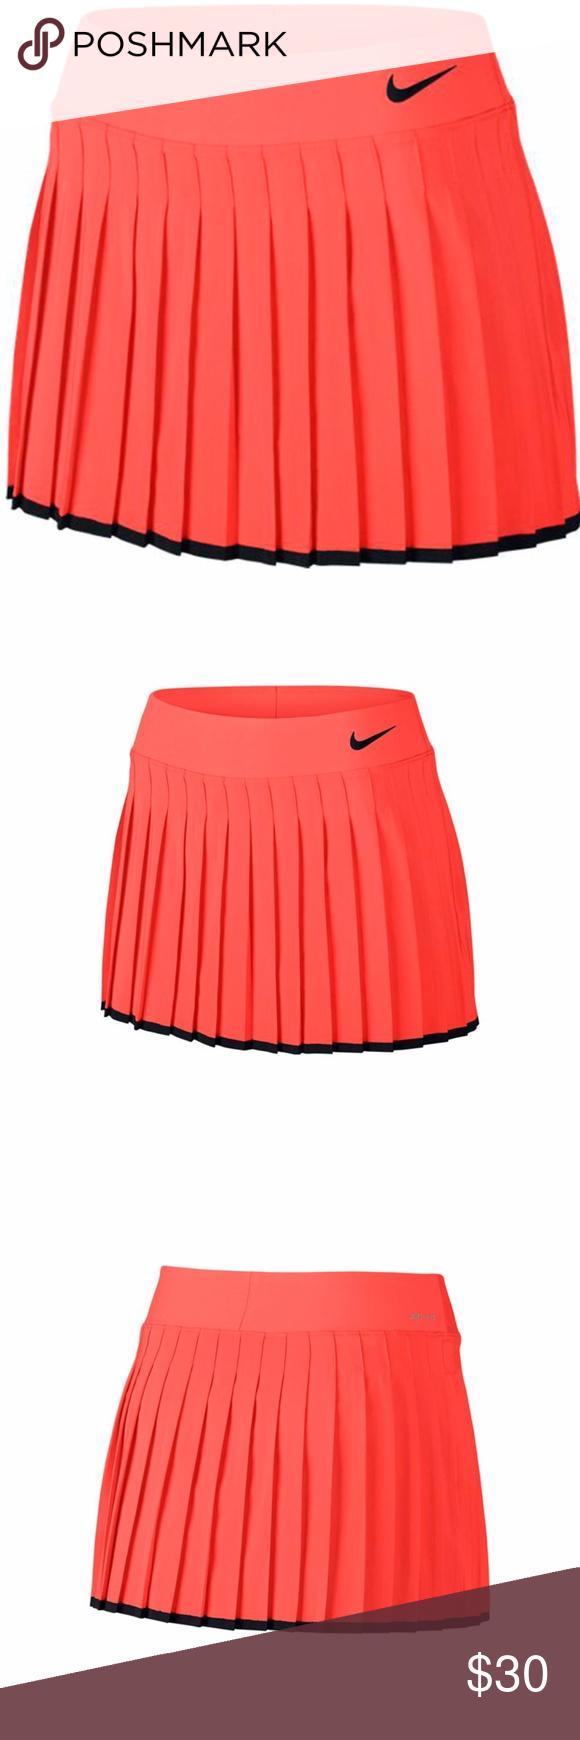 Nikecourt Premier 13 Inches Victory Tennis Skirt Nwt Tennis Skirt Womens Tennis Skirts Orange Fashion